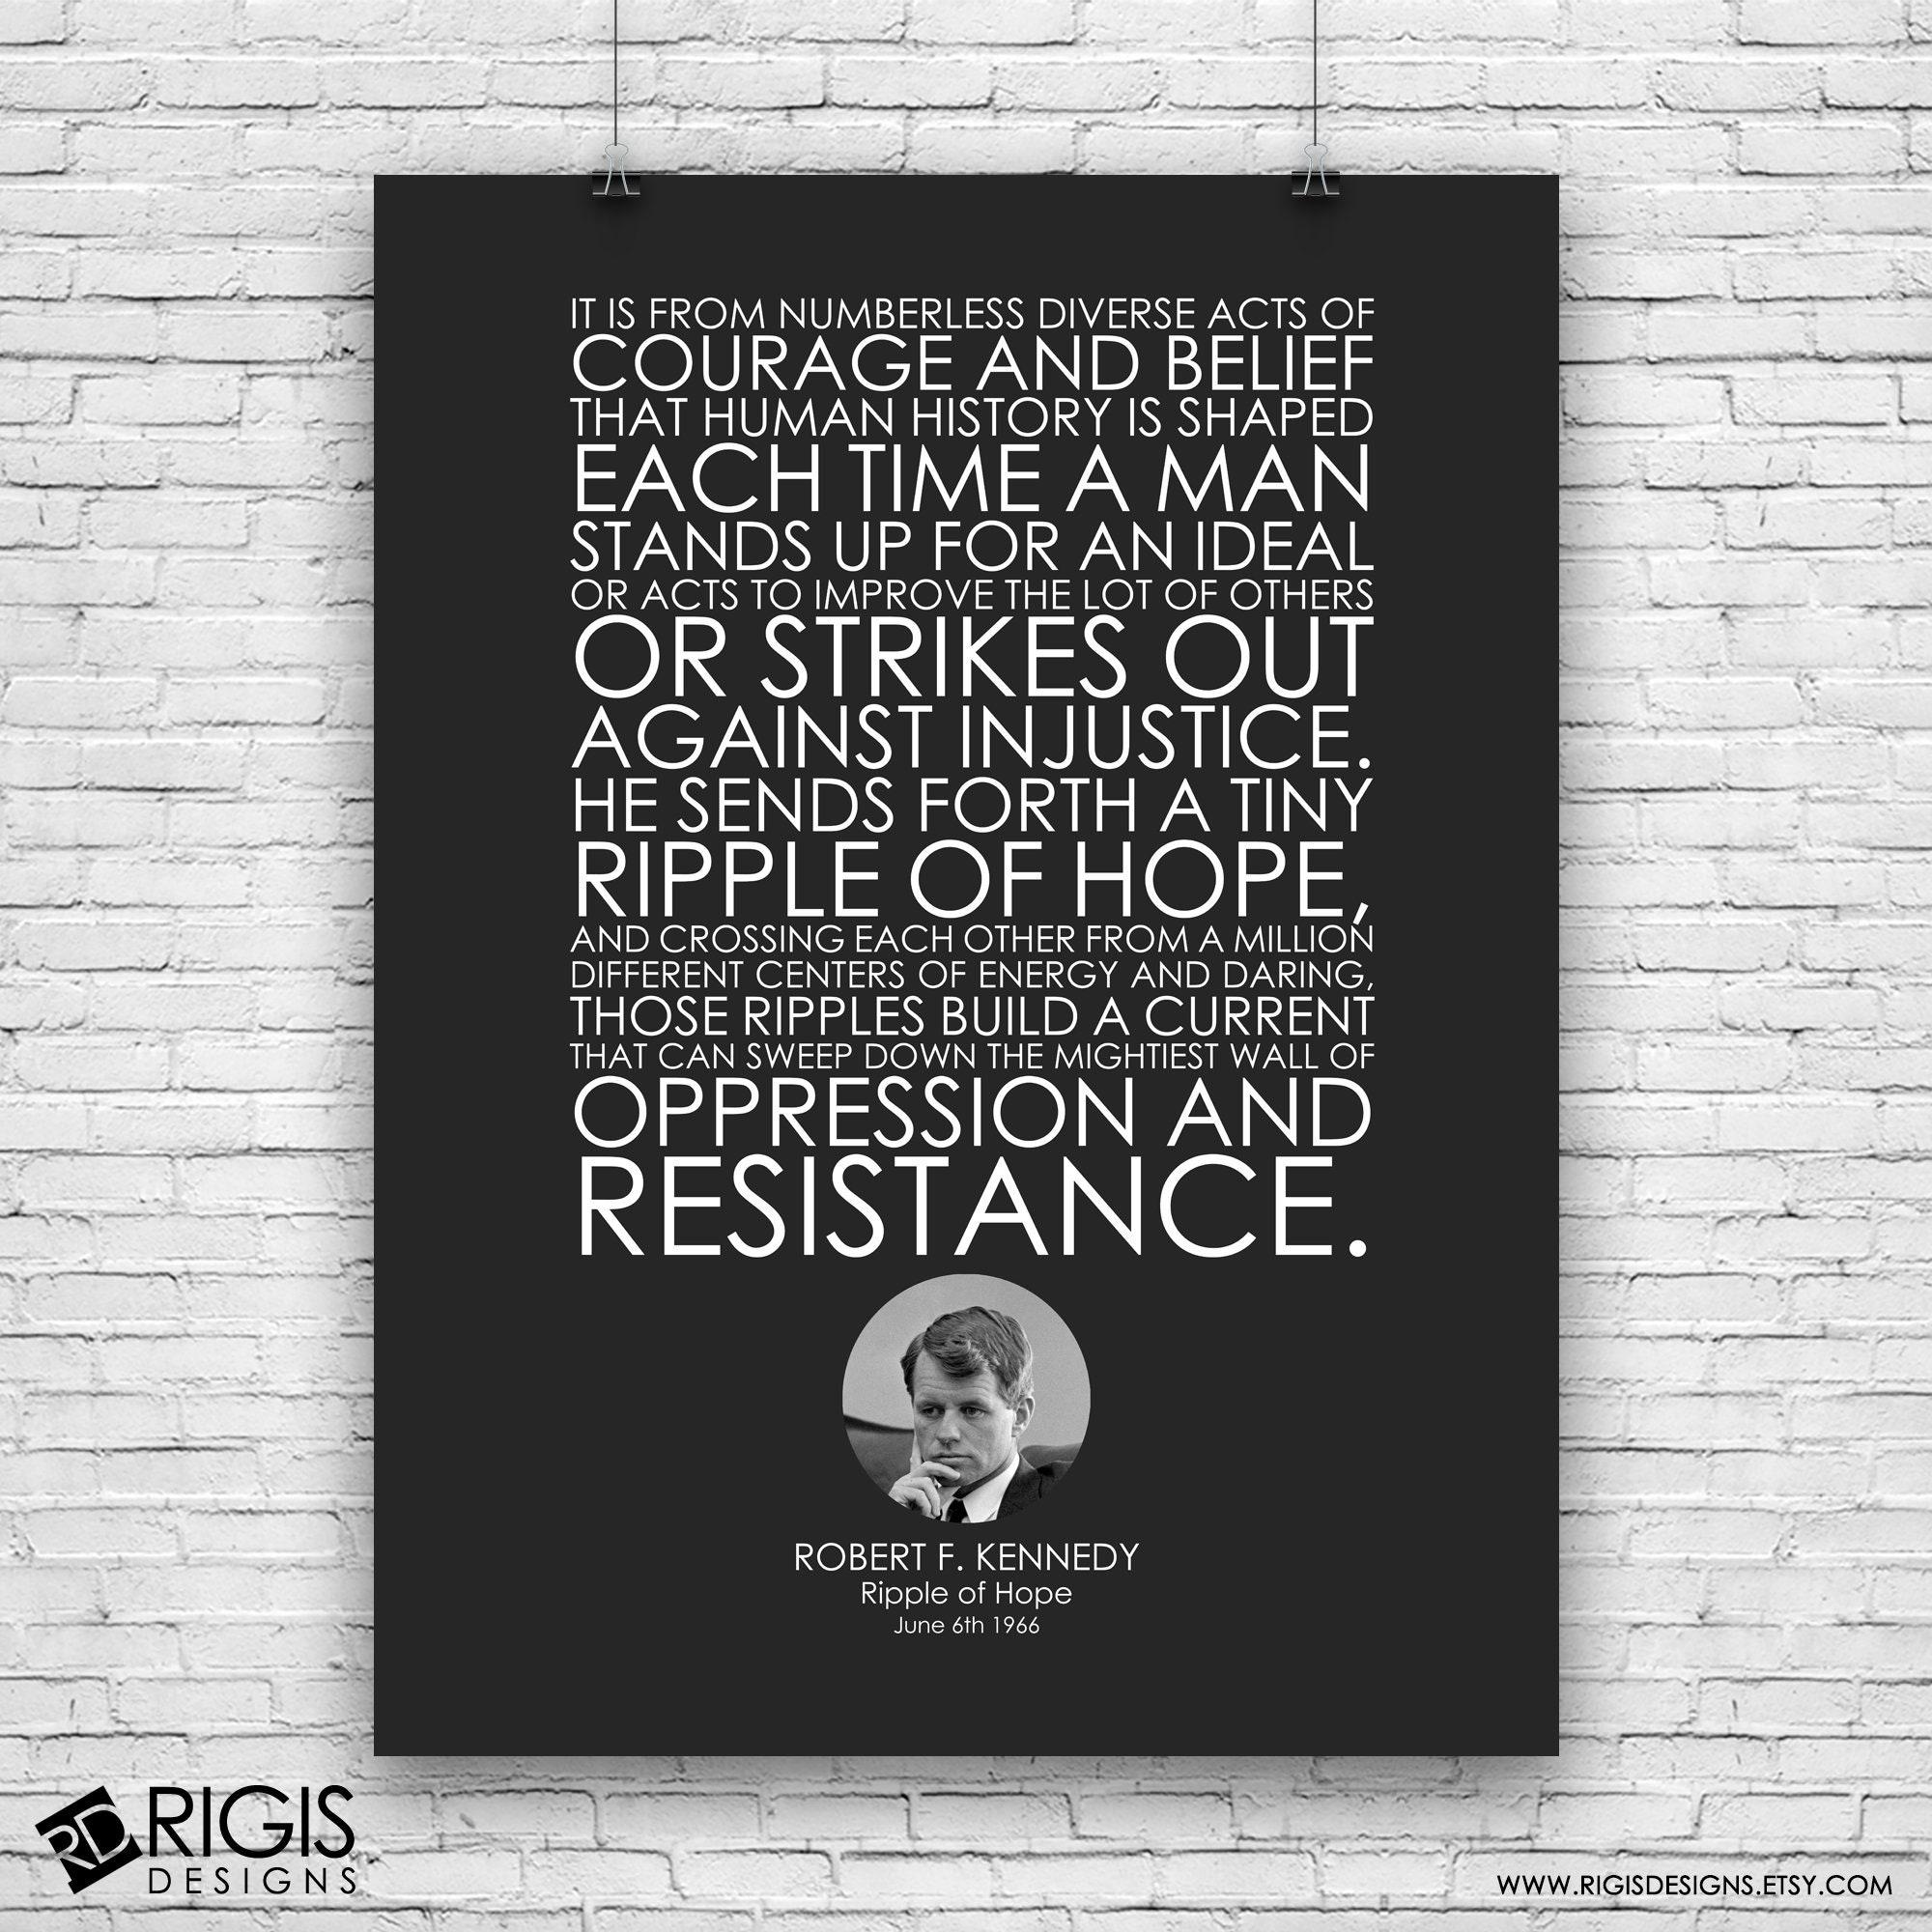 Robert F. Kennedy, Ripple of Hope Speech